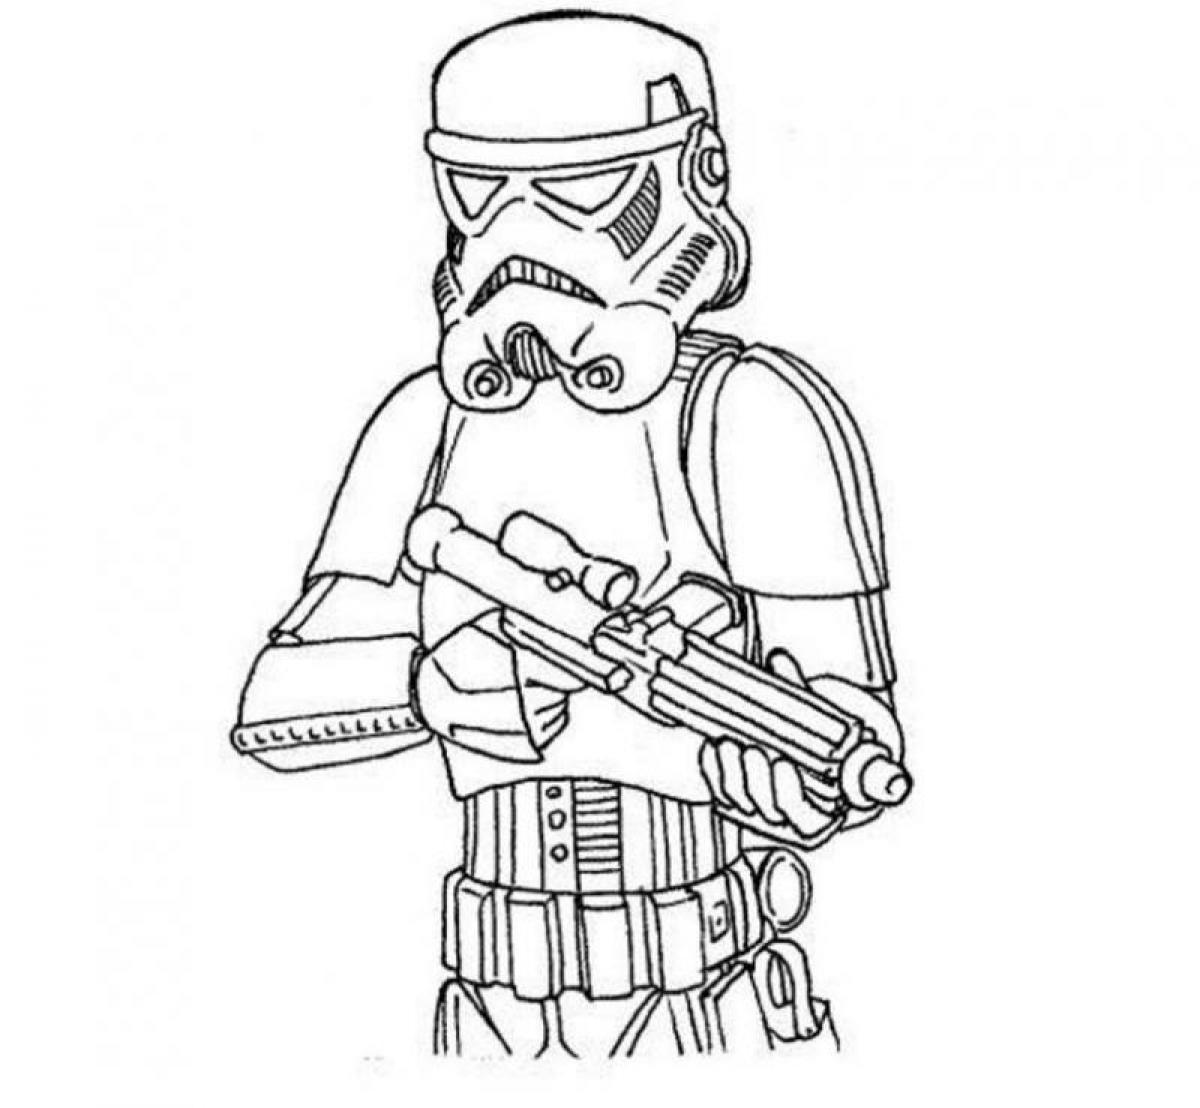 9 Best Images of Baby Stormtrooper Star Wars Printables